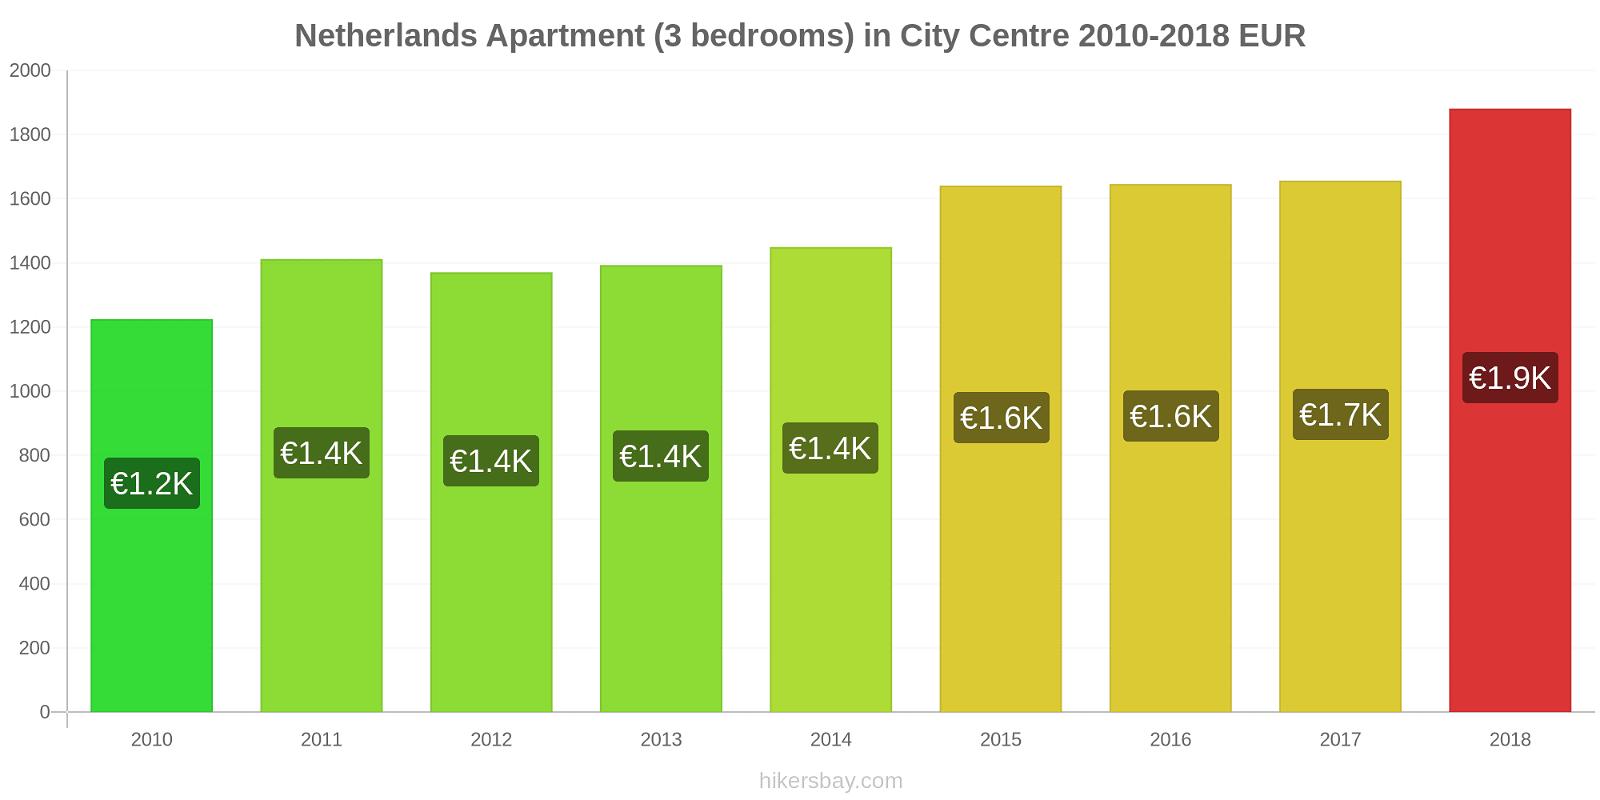 Netherlands price changes Apartment (3 bedrooms) in City Centre hikersbay.com